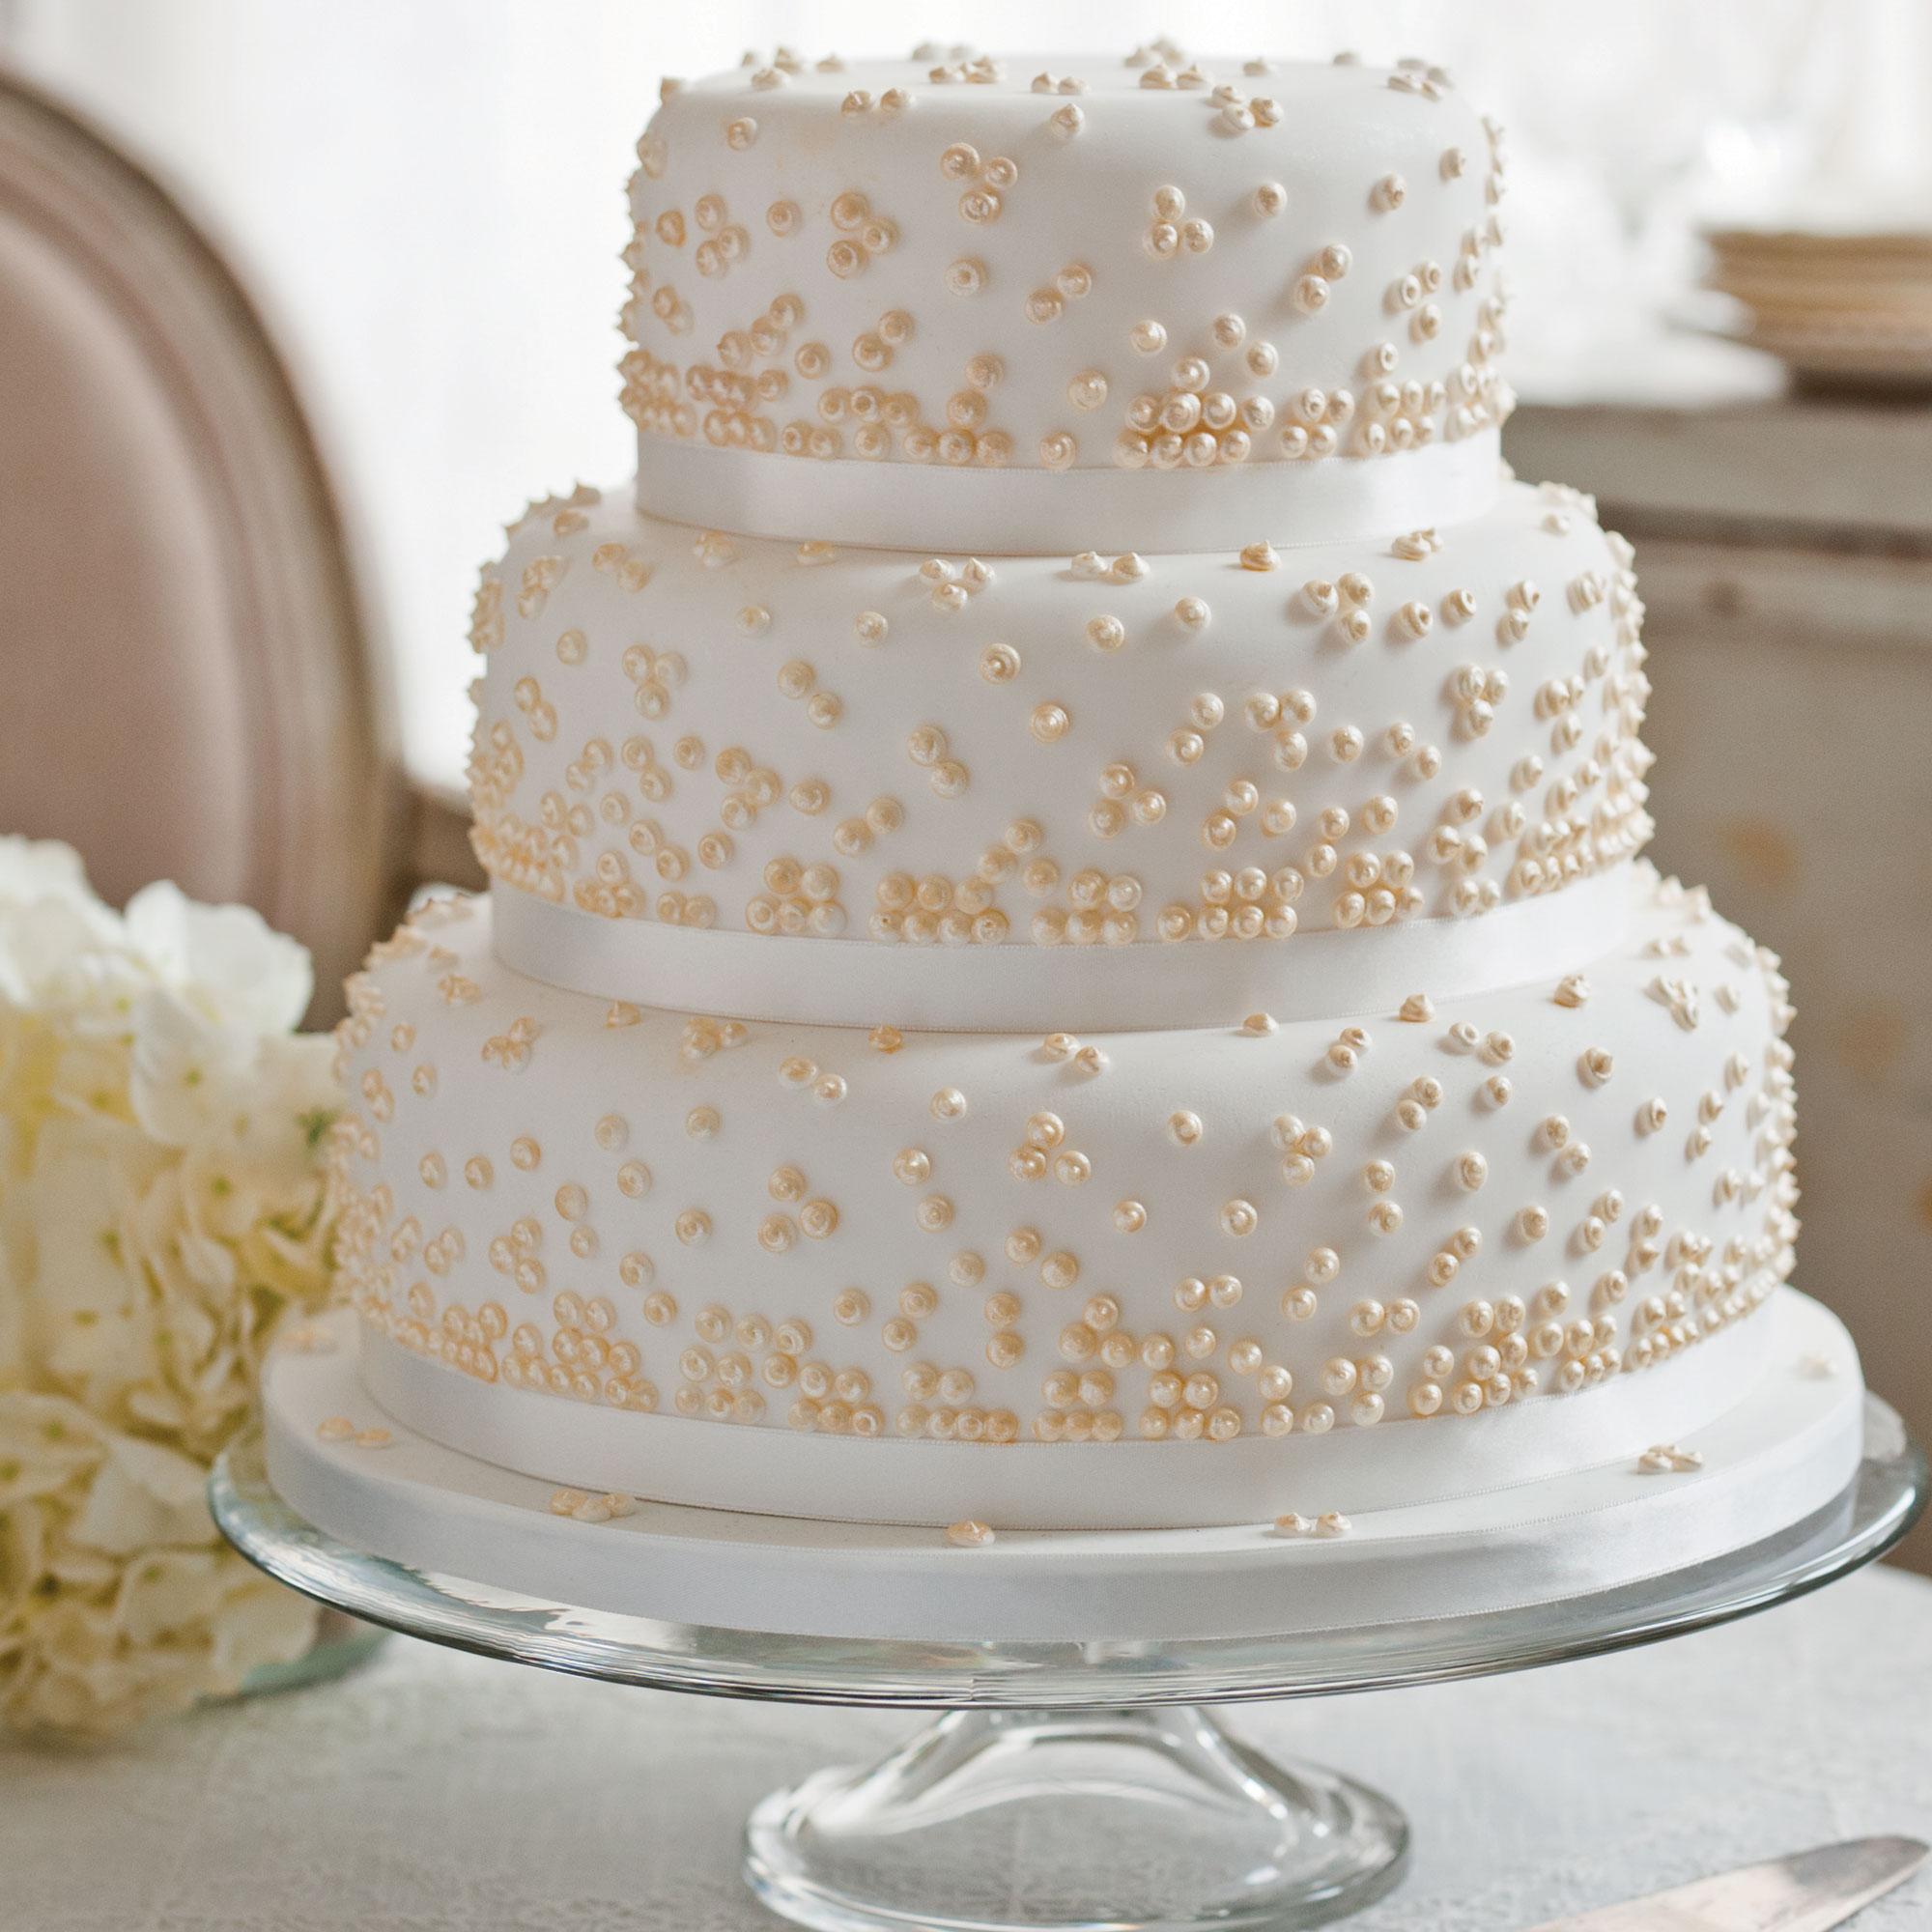 Vanilla 4-Tier Cake